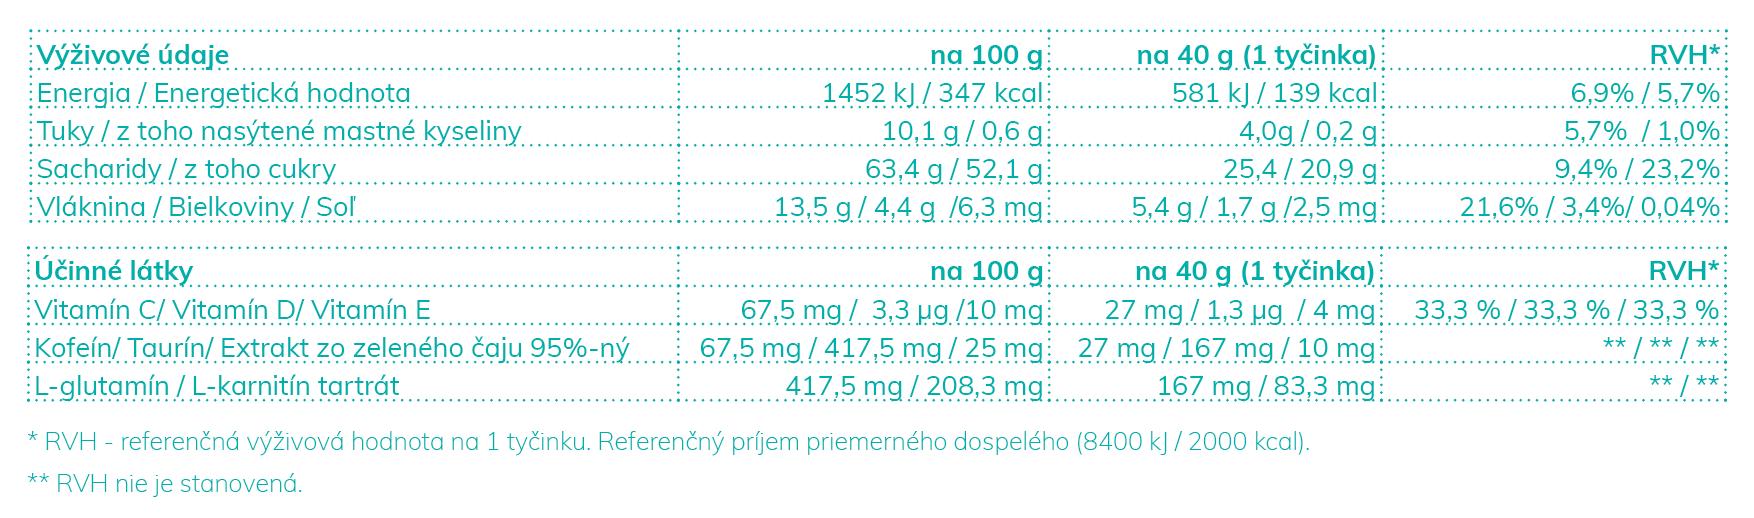 tabulka zachranka